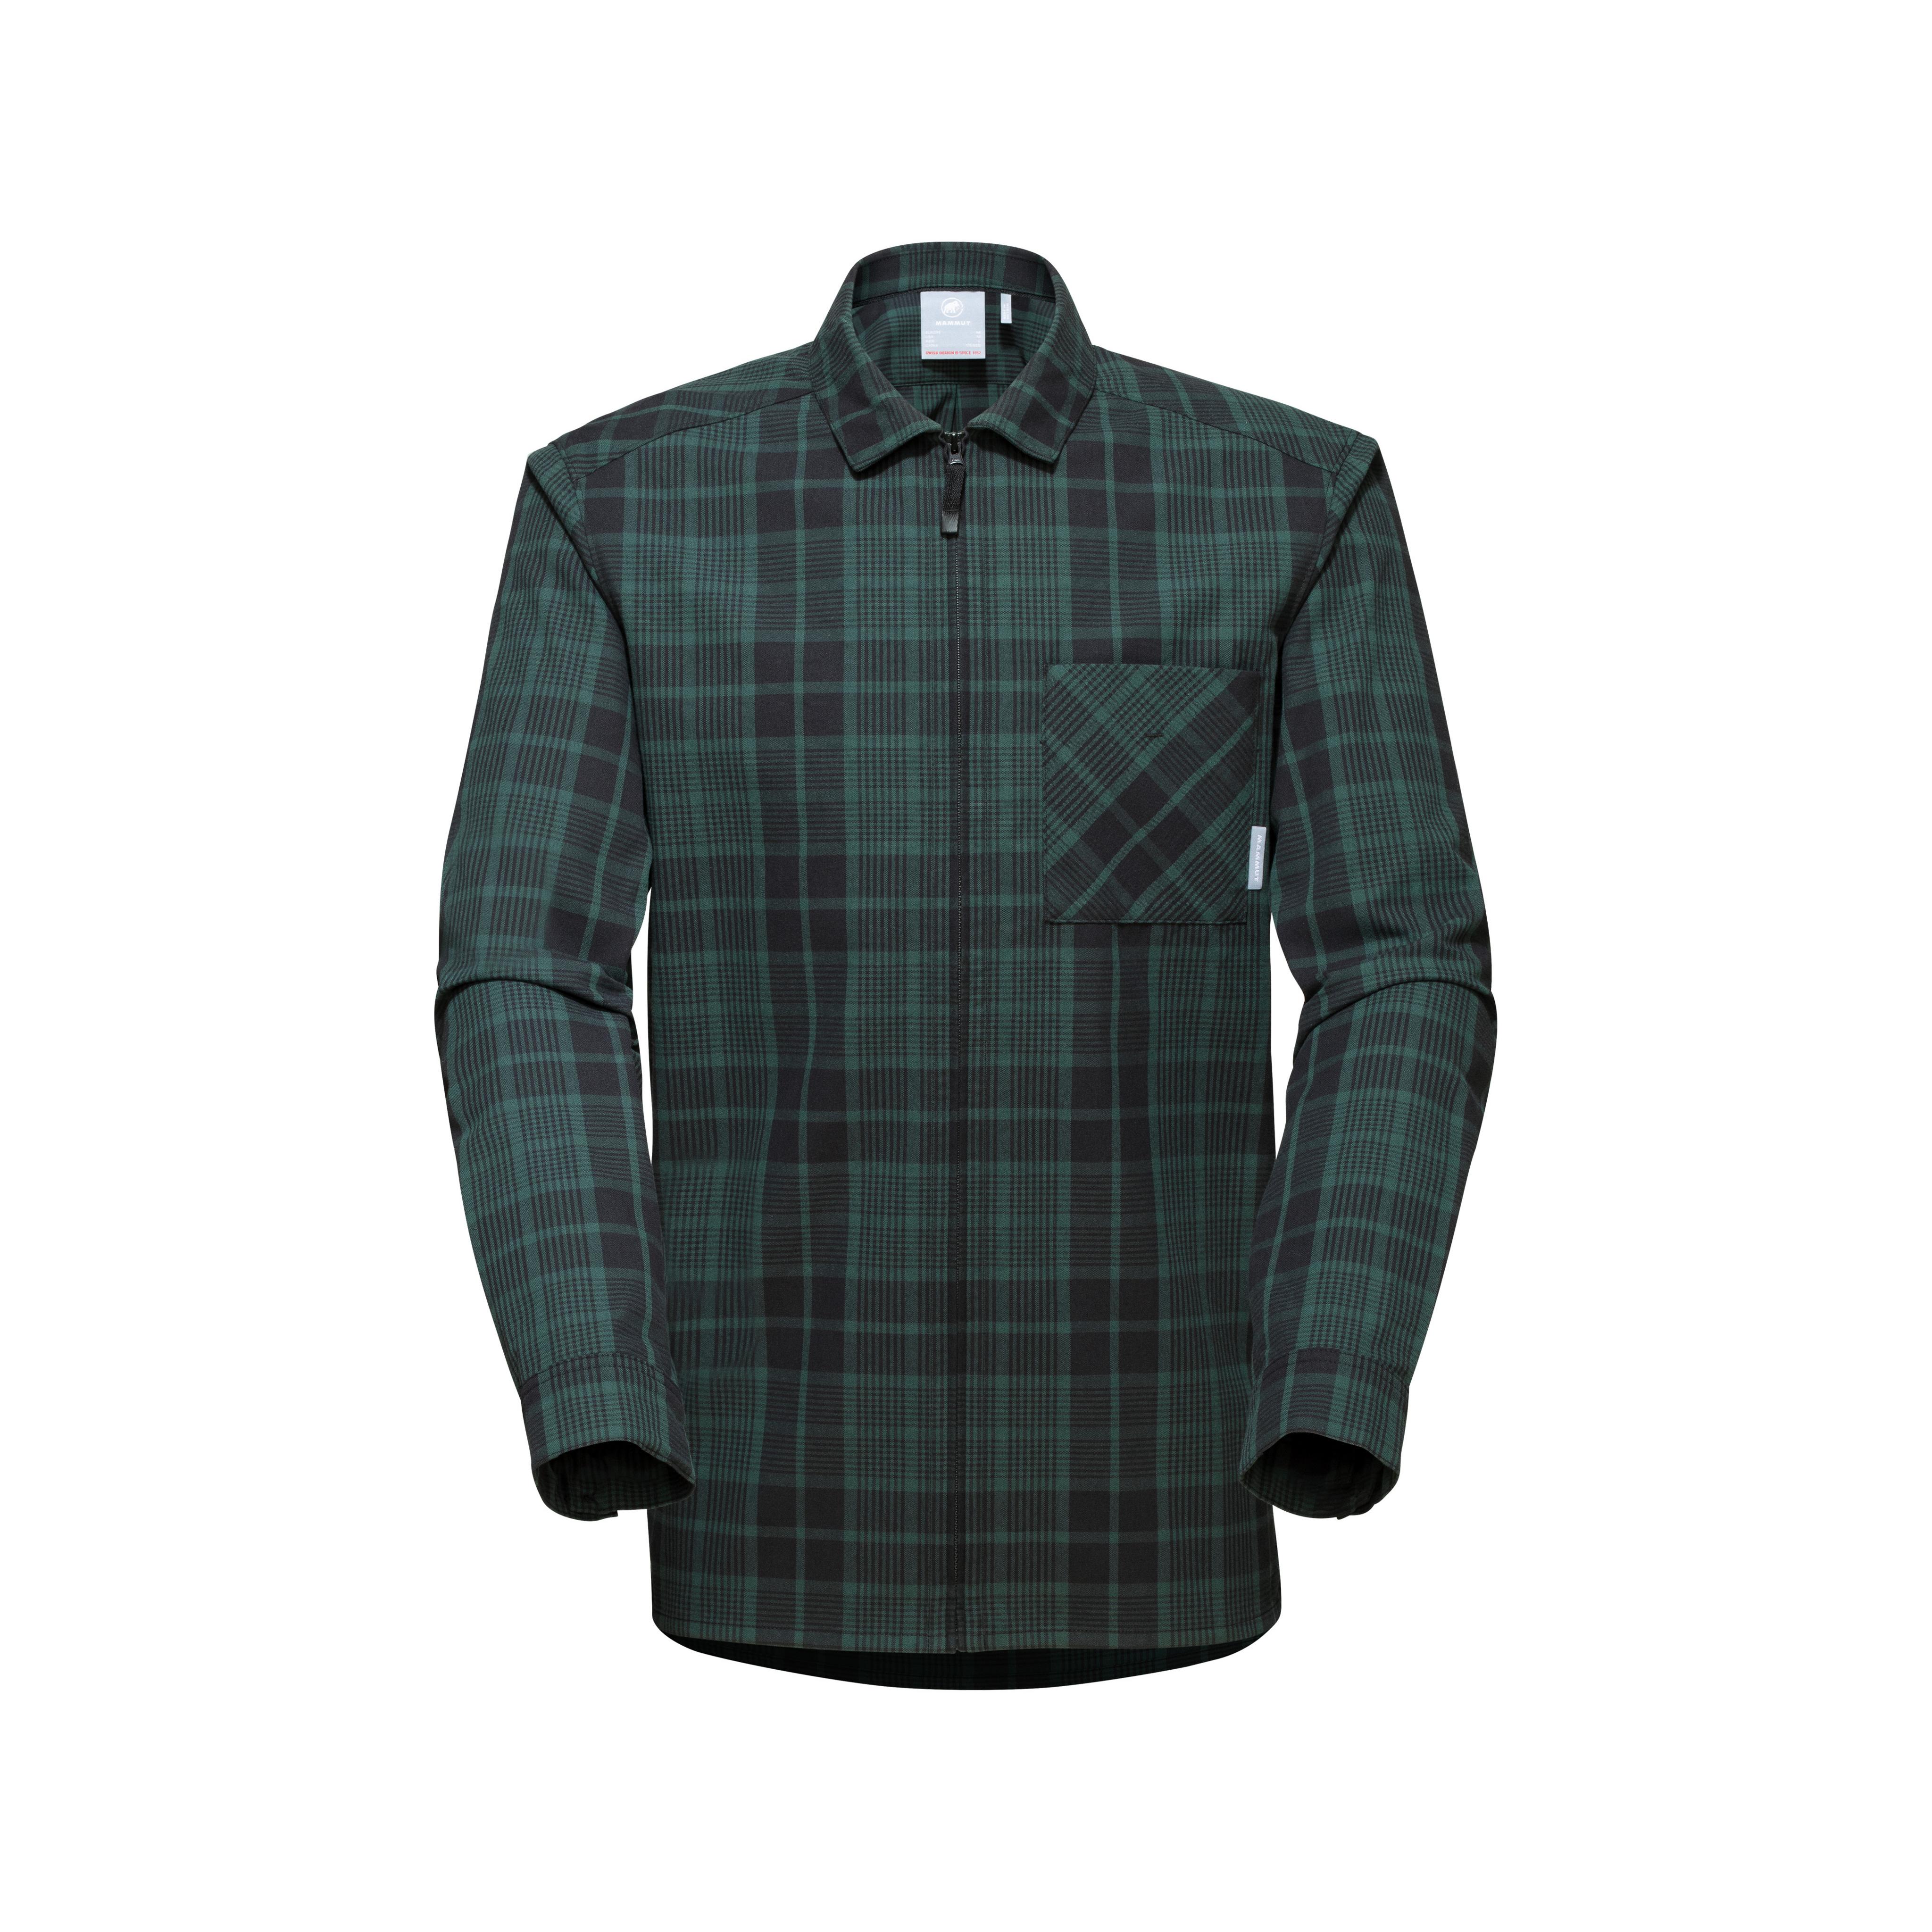 Tamaro Longsleeve Shirt Men - dark teal-black, S thumbnail